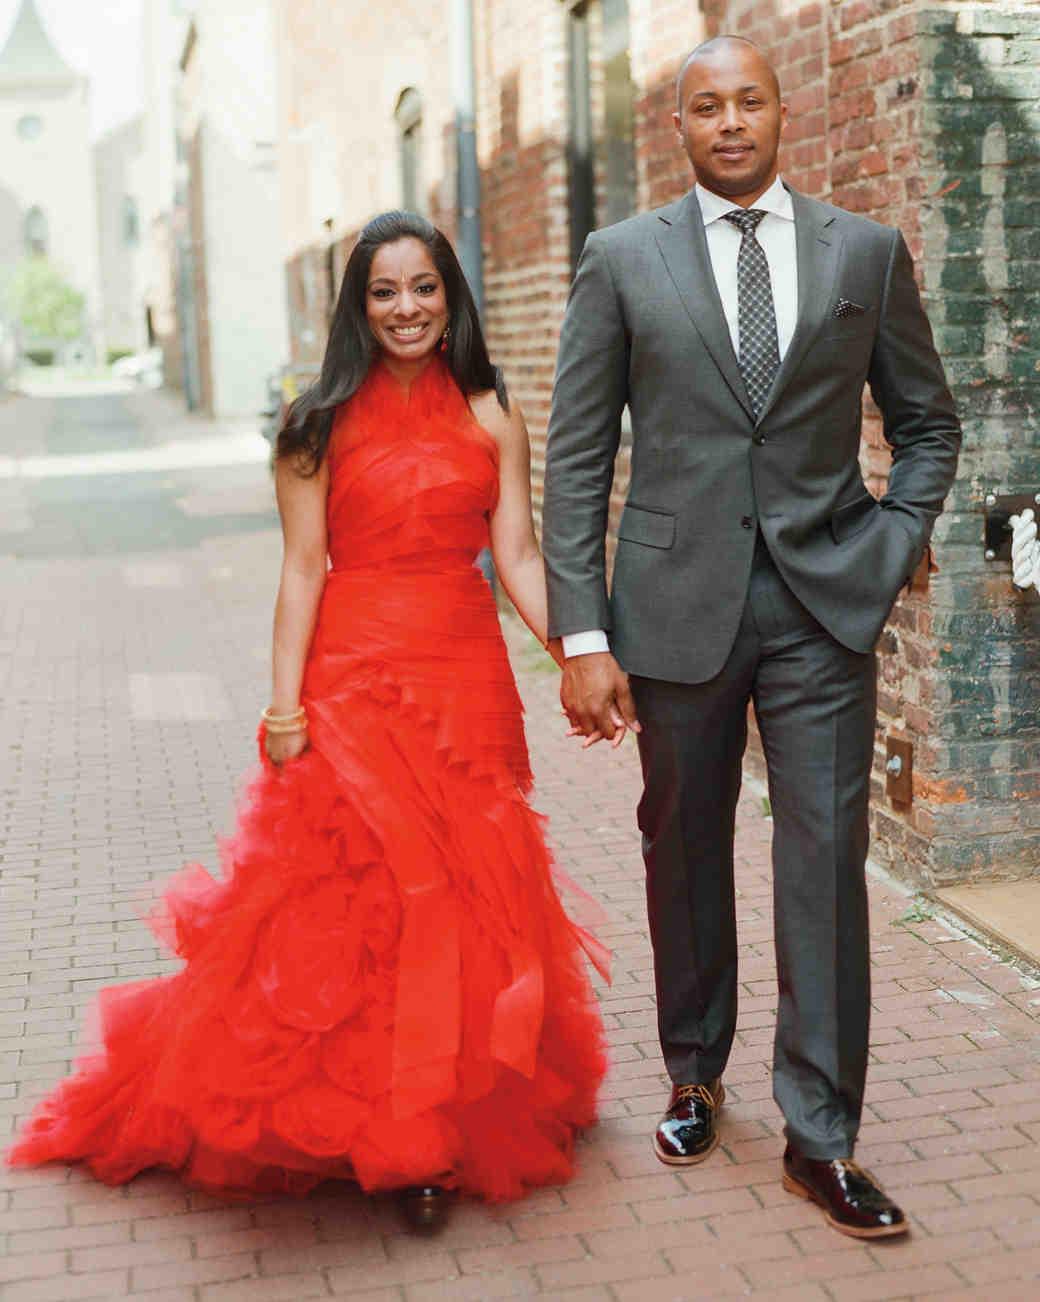 red wedding dresses red wedding dresses 1 of 7